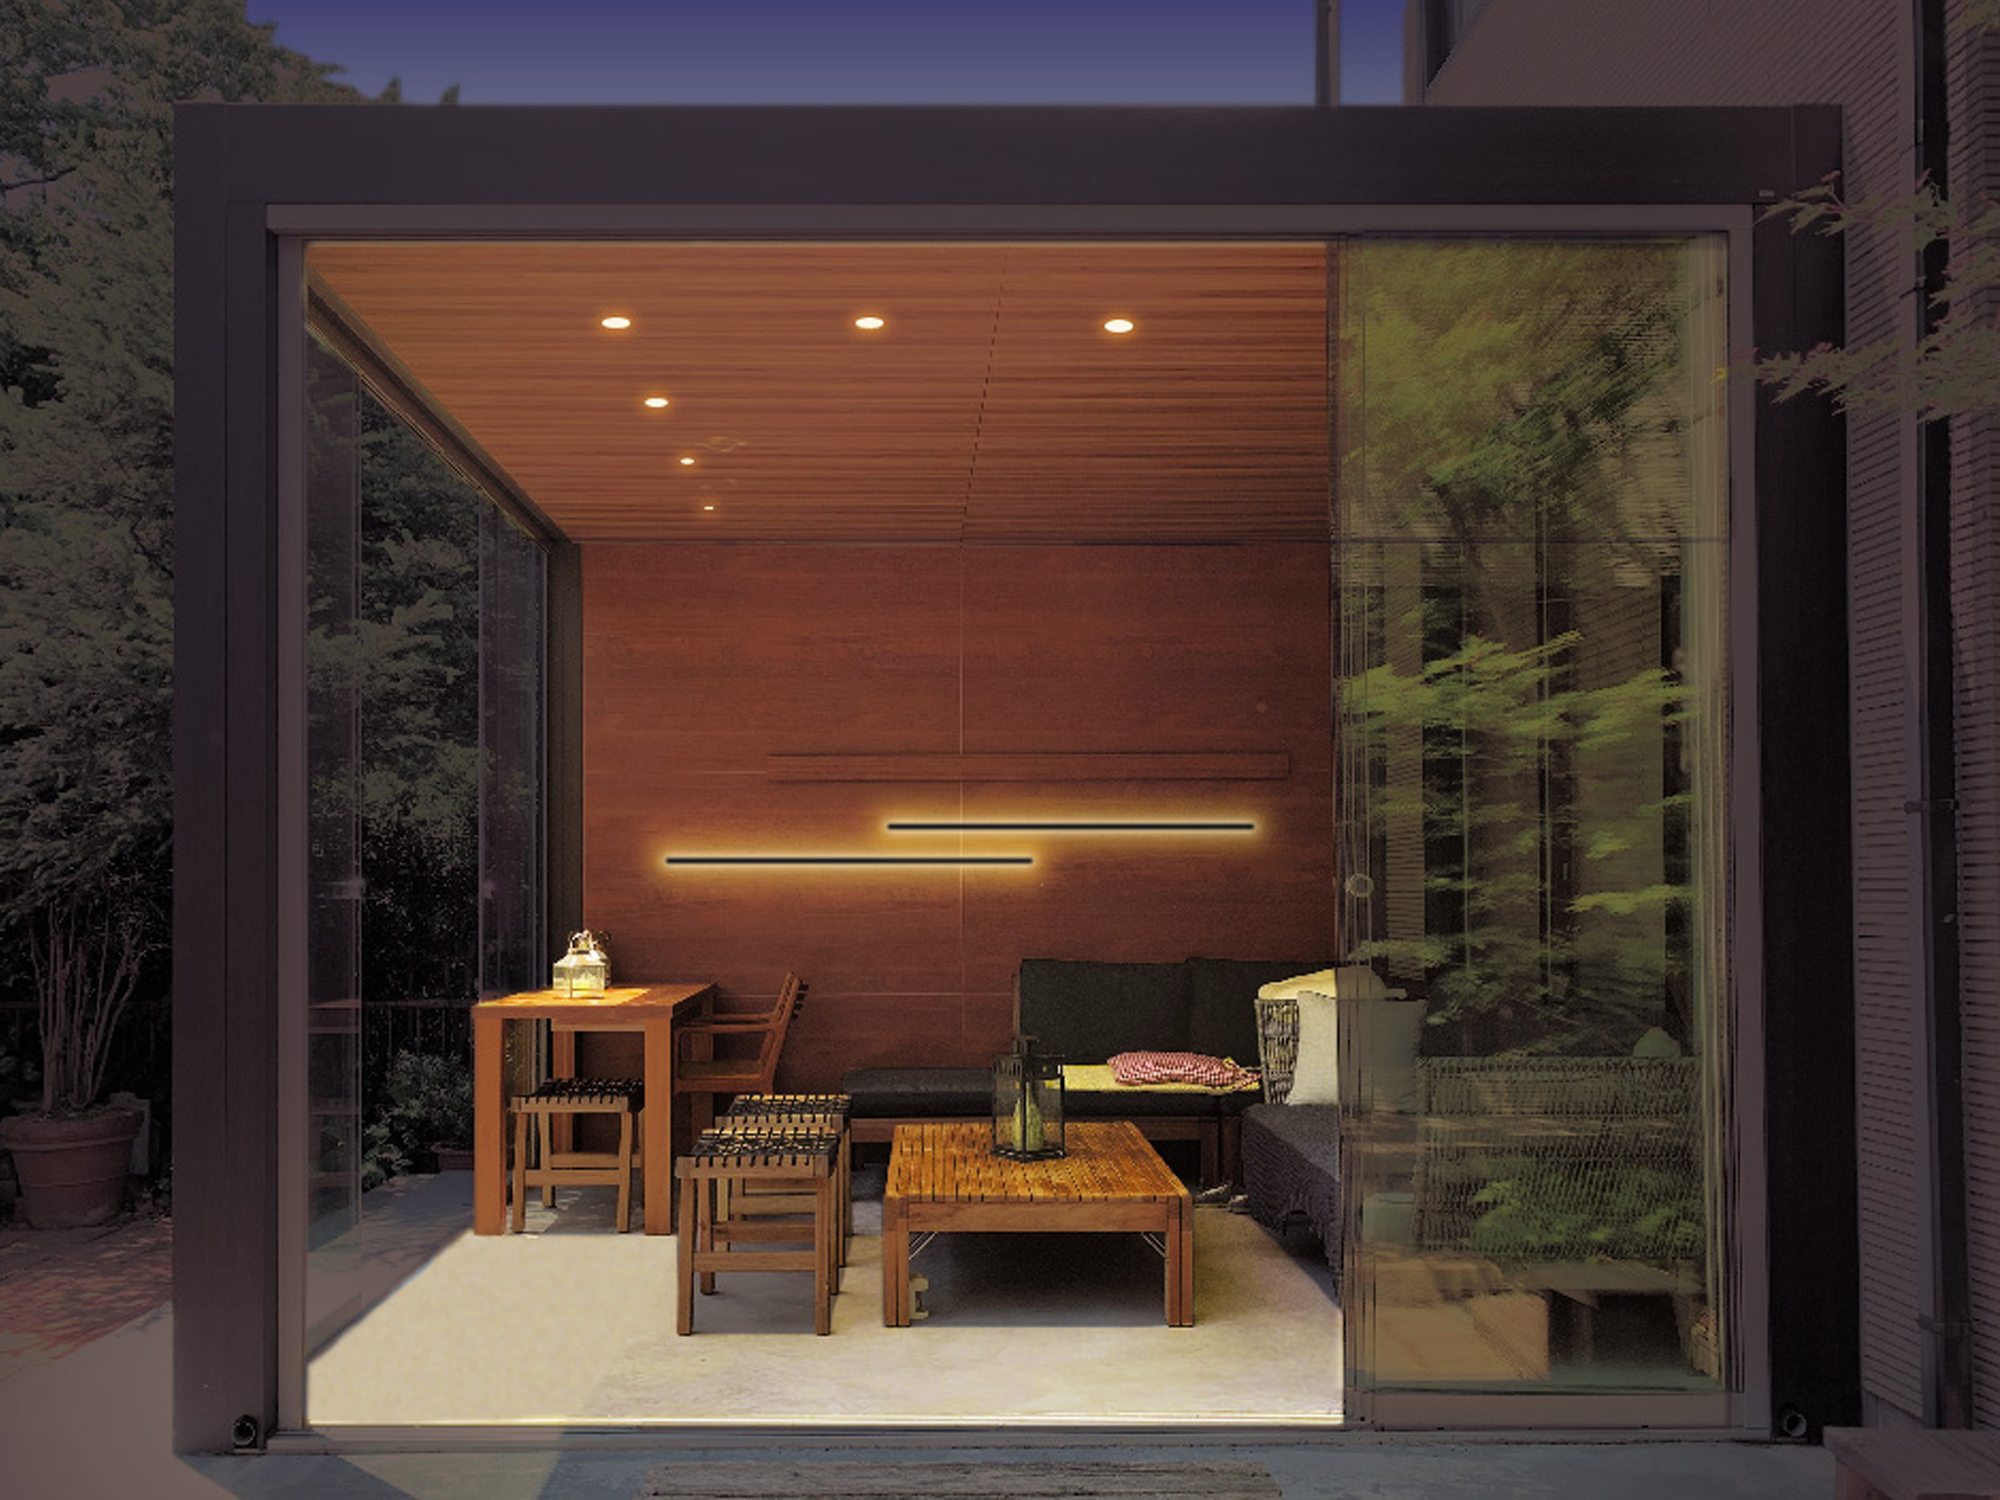 5thROOMにラインウォールライトを装飾的な間接照明として取り入れた例